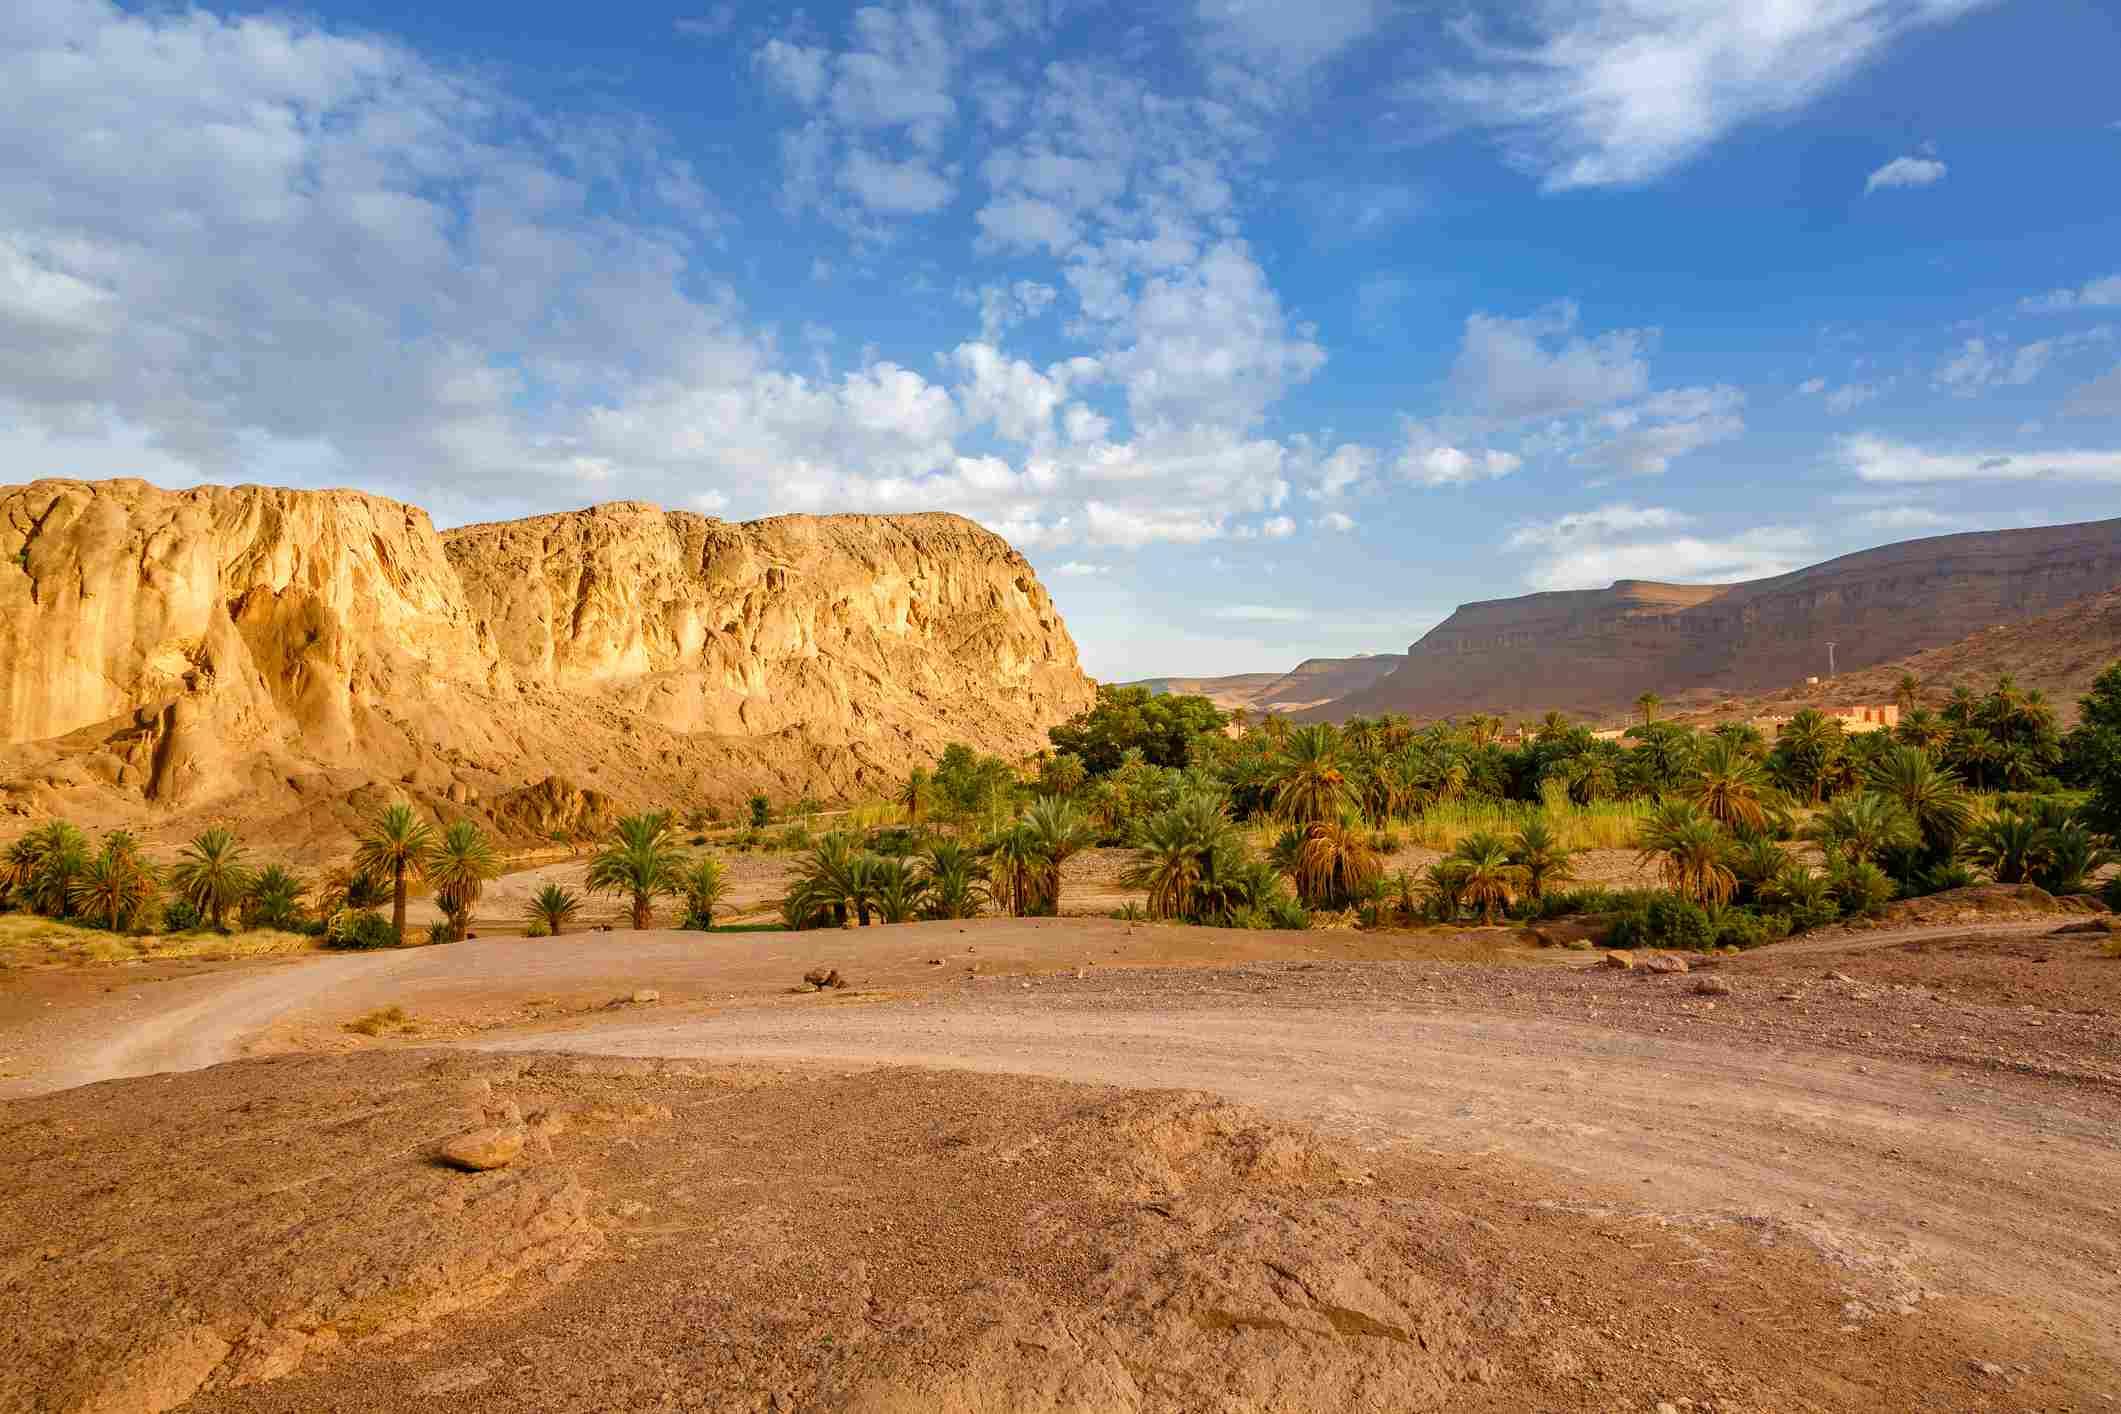 Fint Oasis near Ouarzazate, Morocco